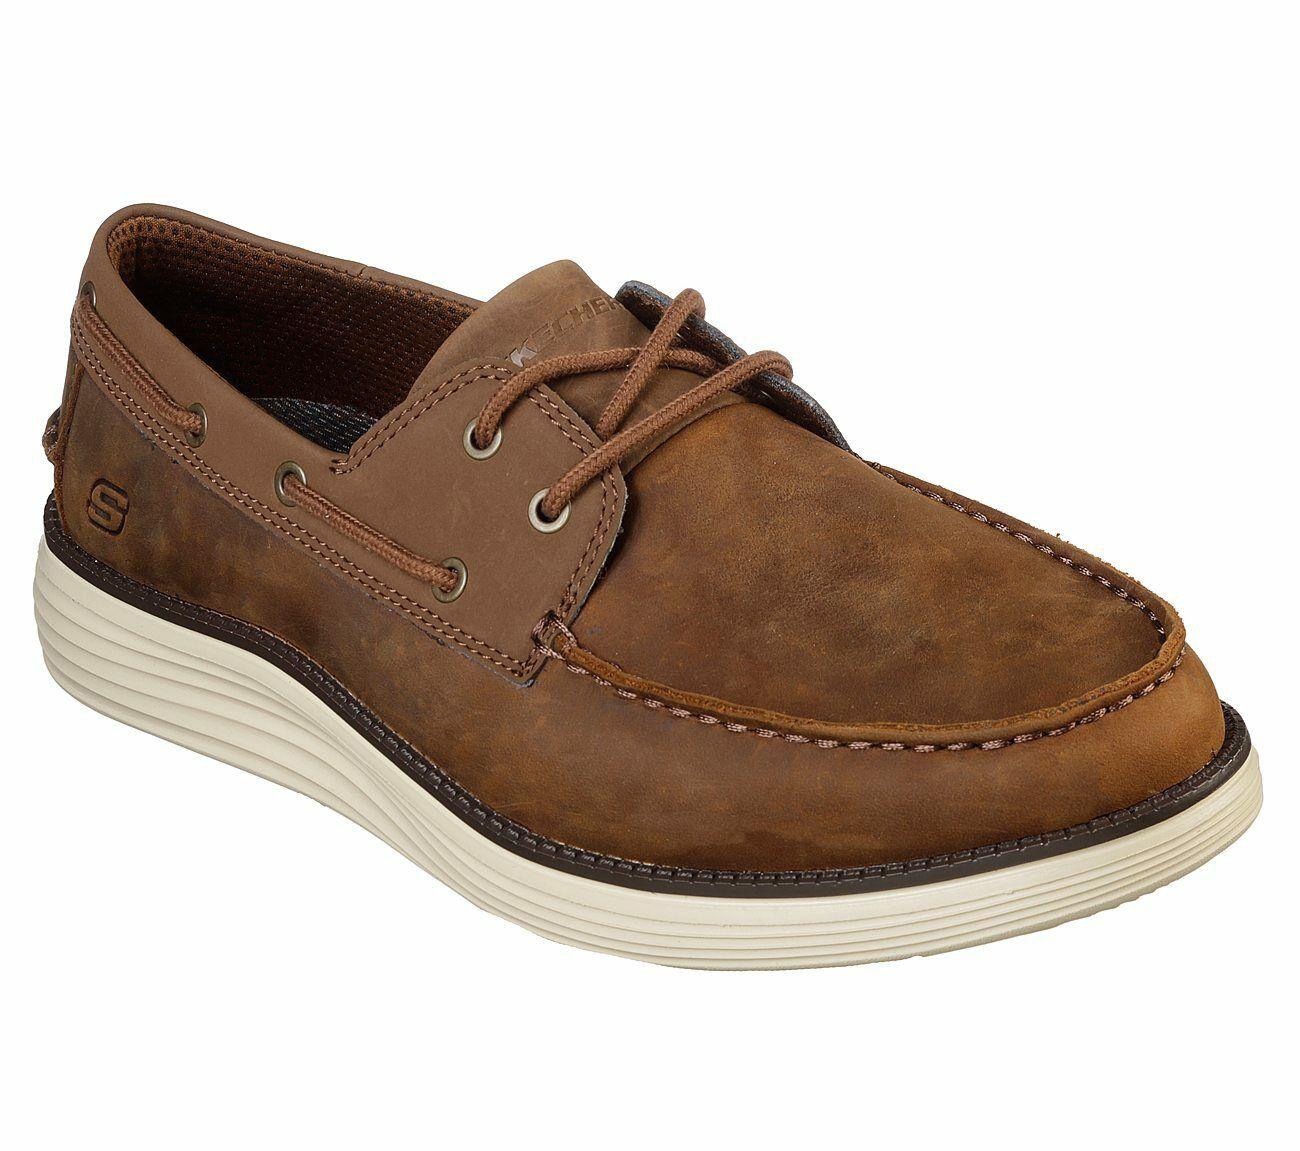 Skechers Wide Fit Brown Shoe Men Memory